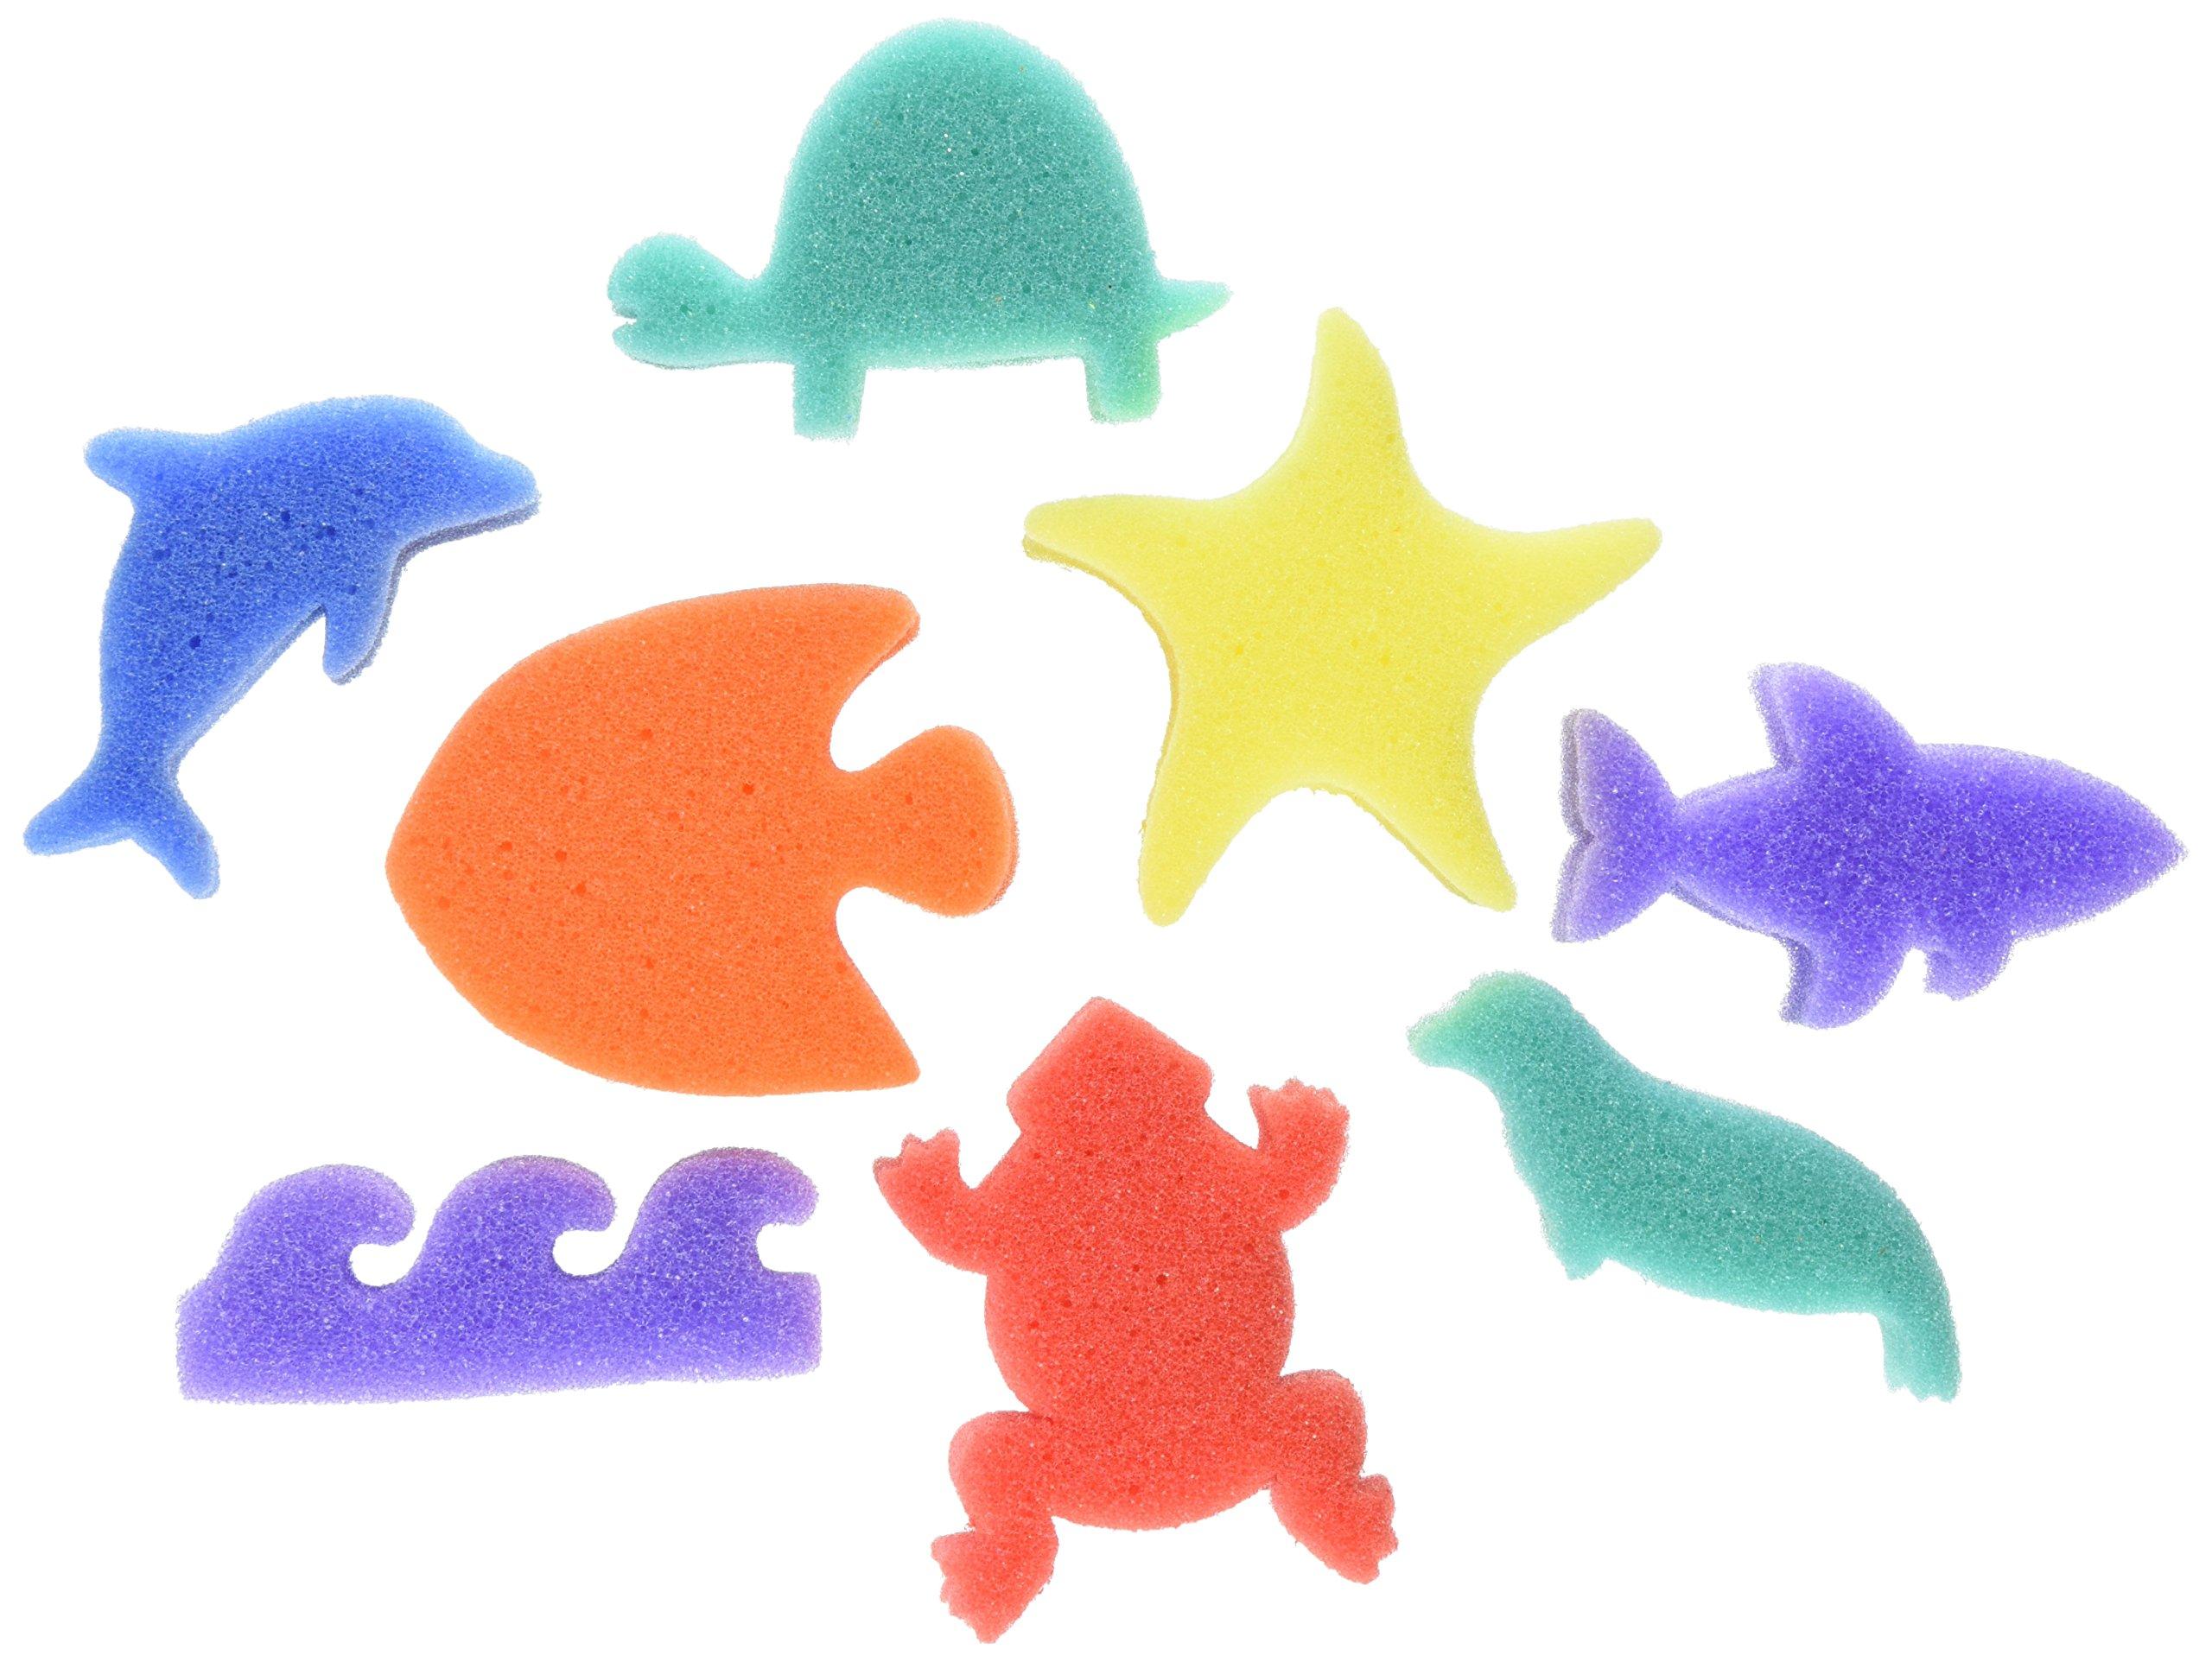 Creativity Street AC9073 Ocean Paint Sponge, 3'' Size (Pack of 8)